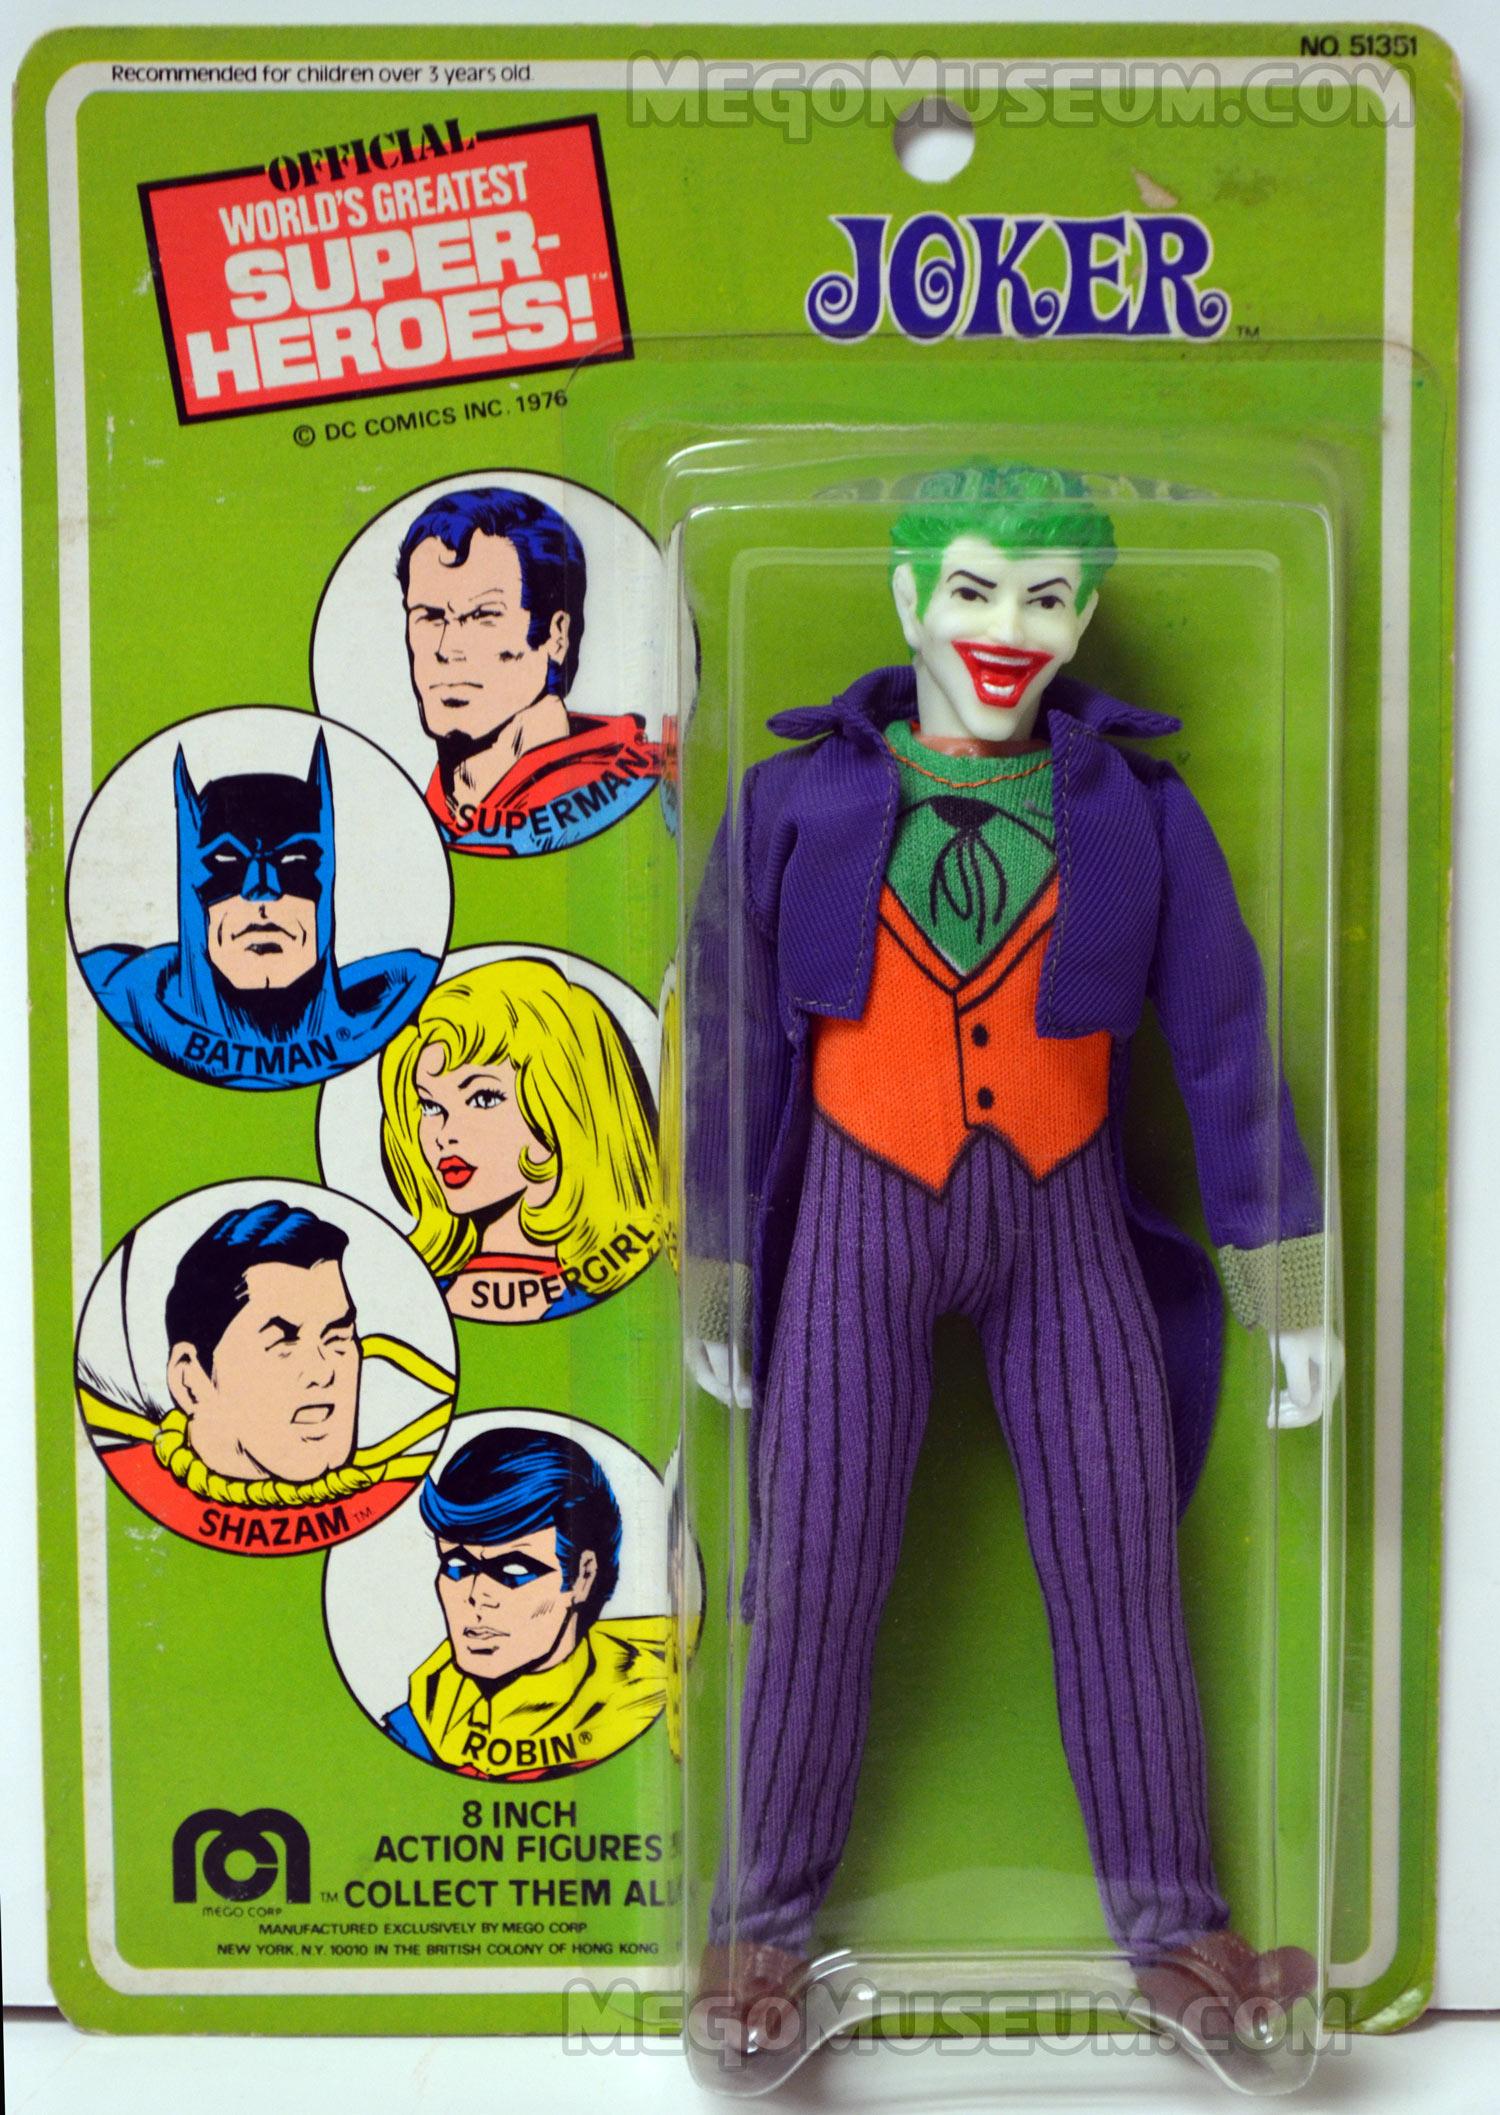 1976 Mego Corp Joker MOC